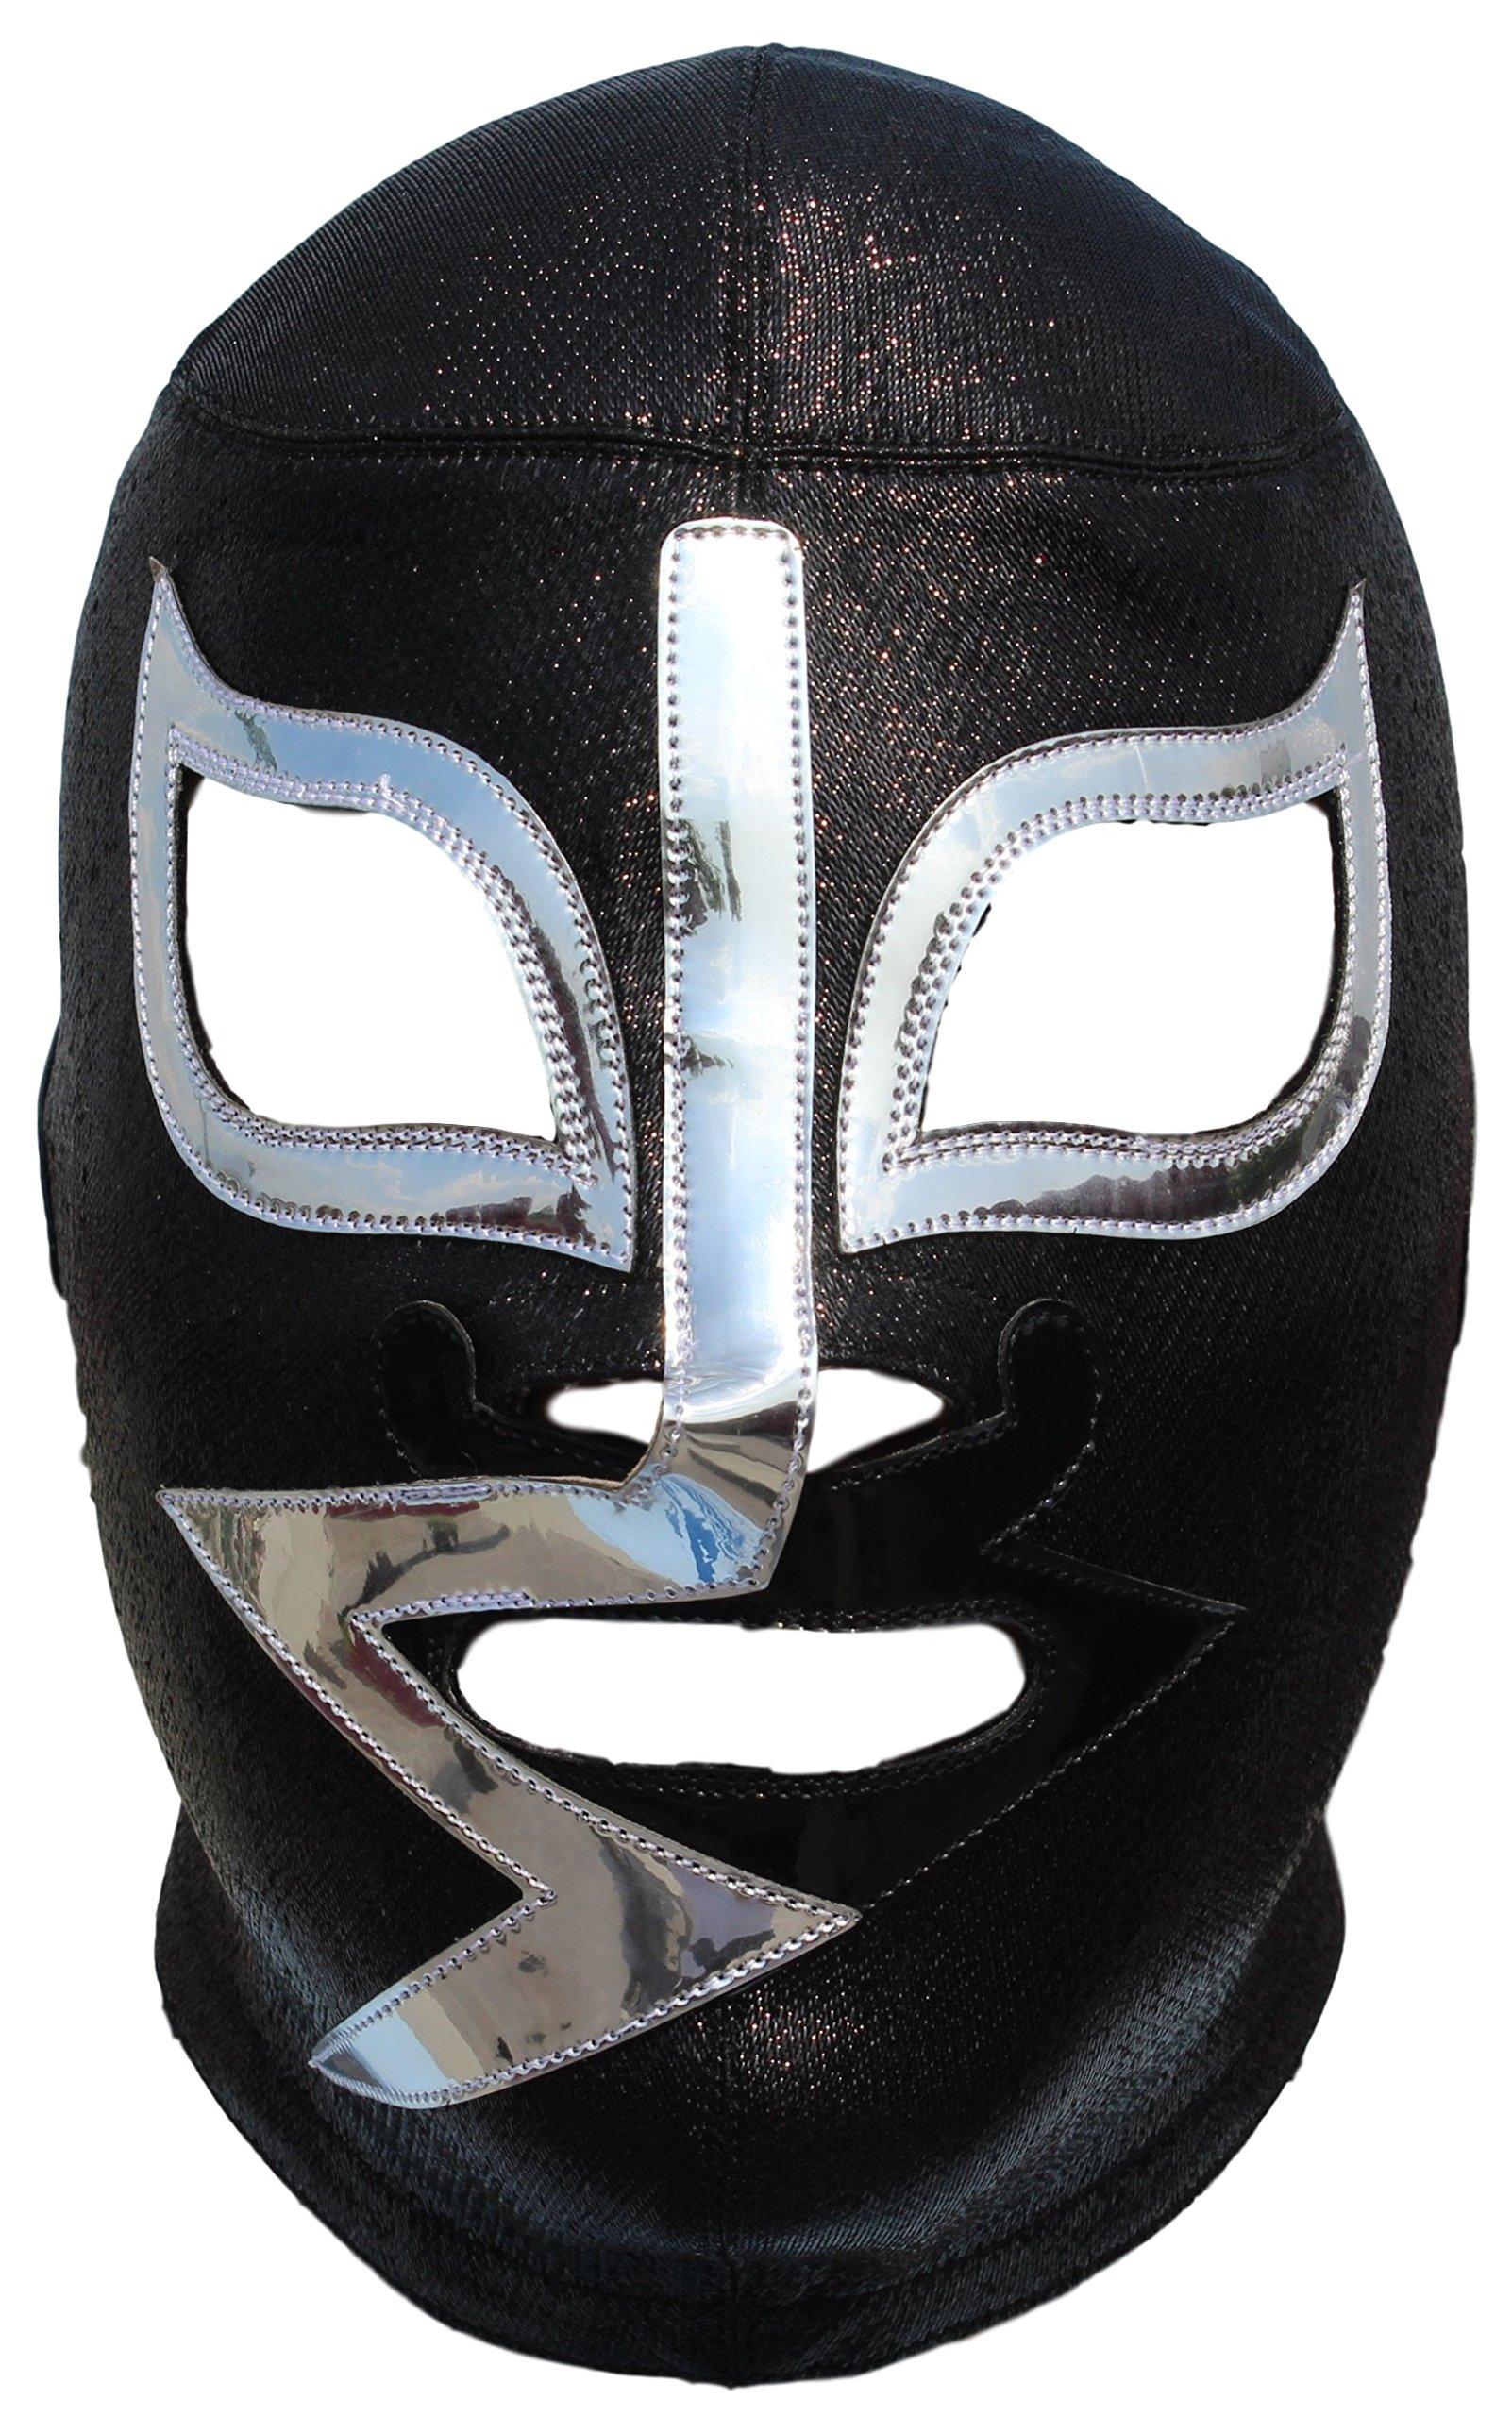 Deportes Martinez Rayo de Jalisco Professional Lucha Libre Mask Adult Luchador Mask